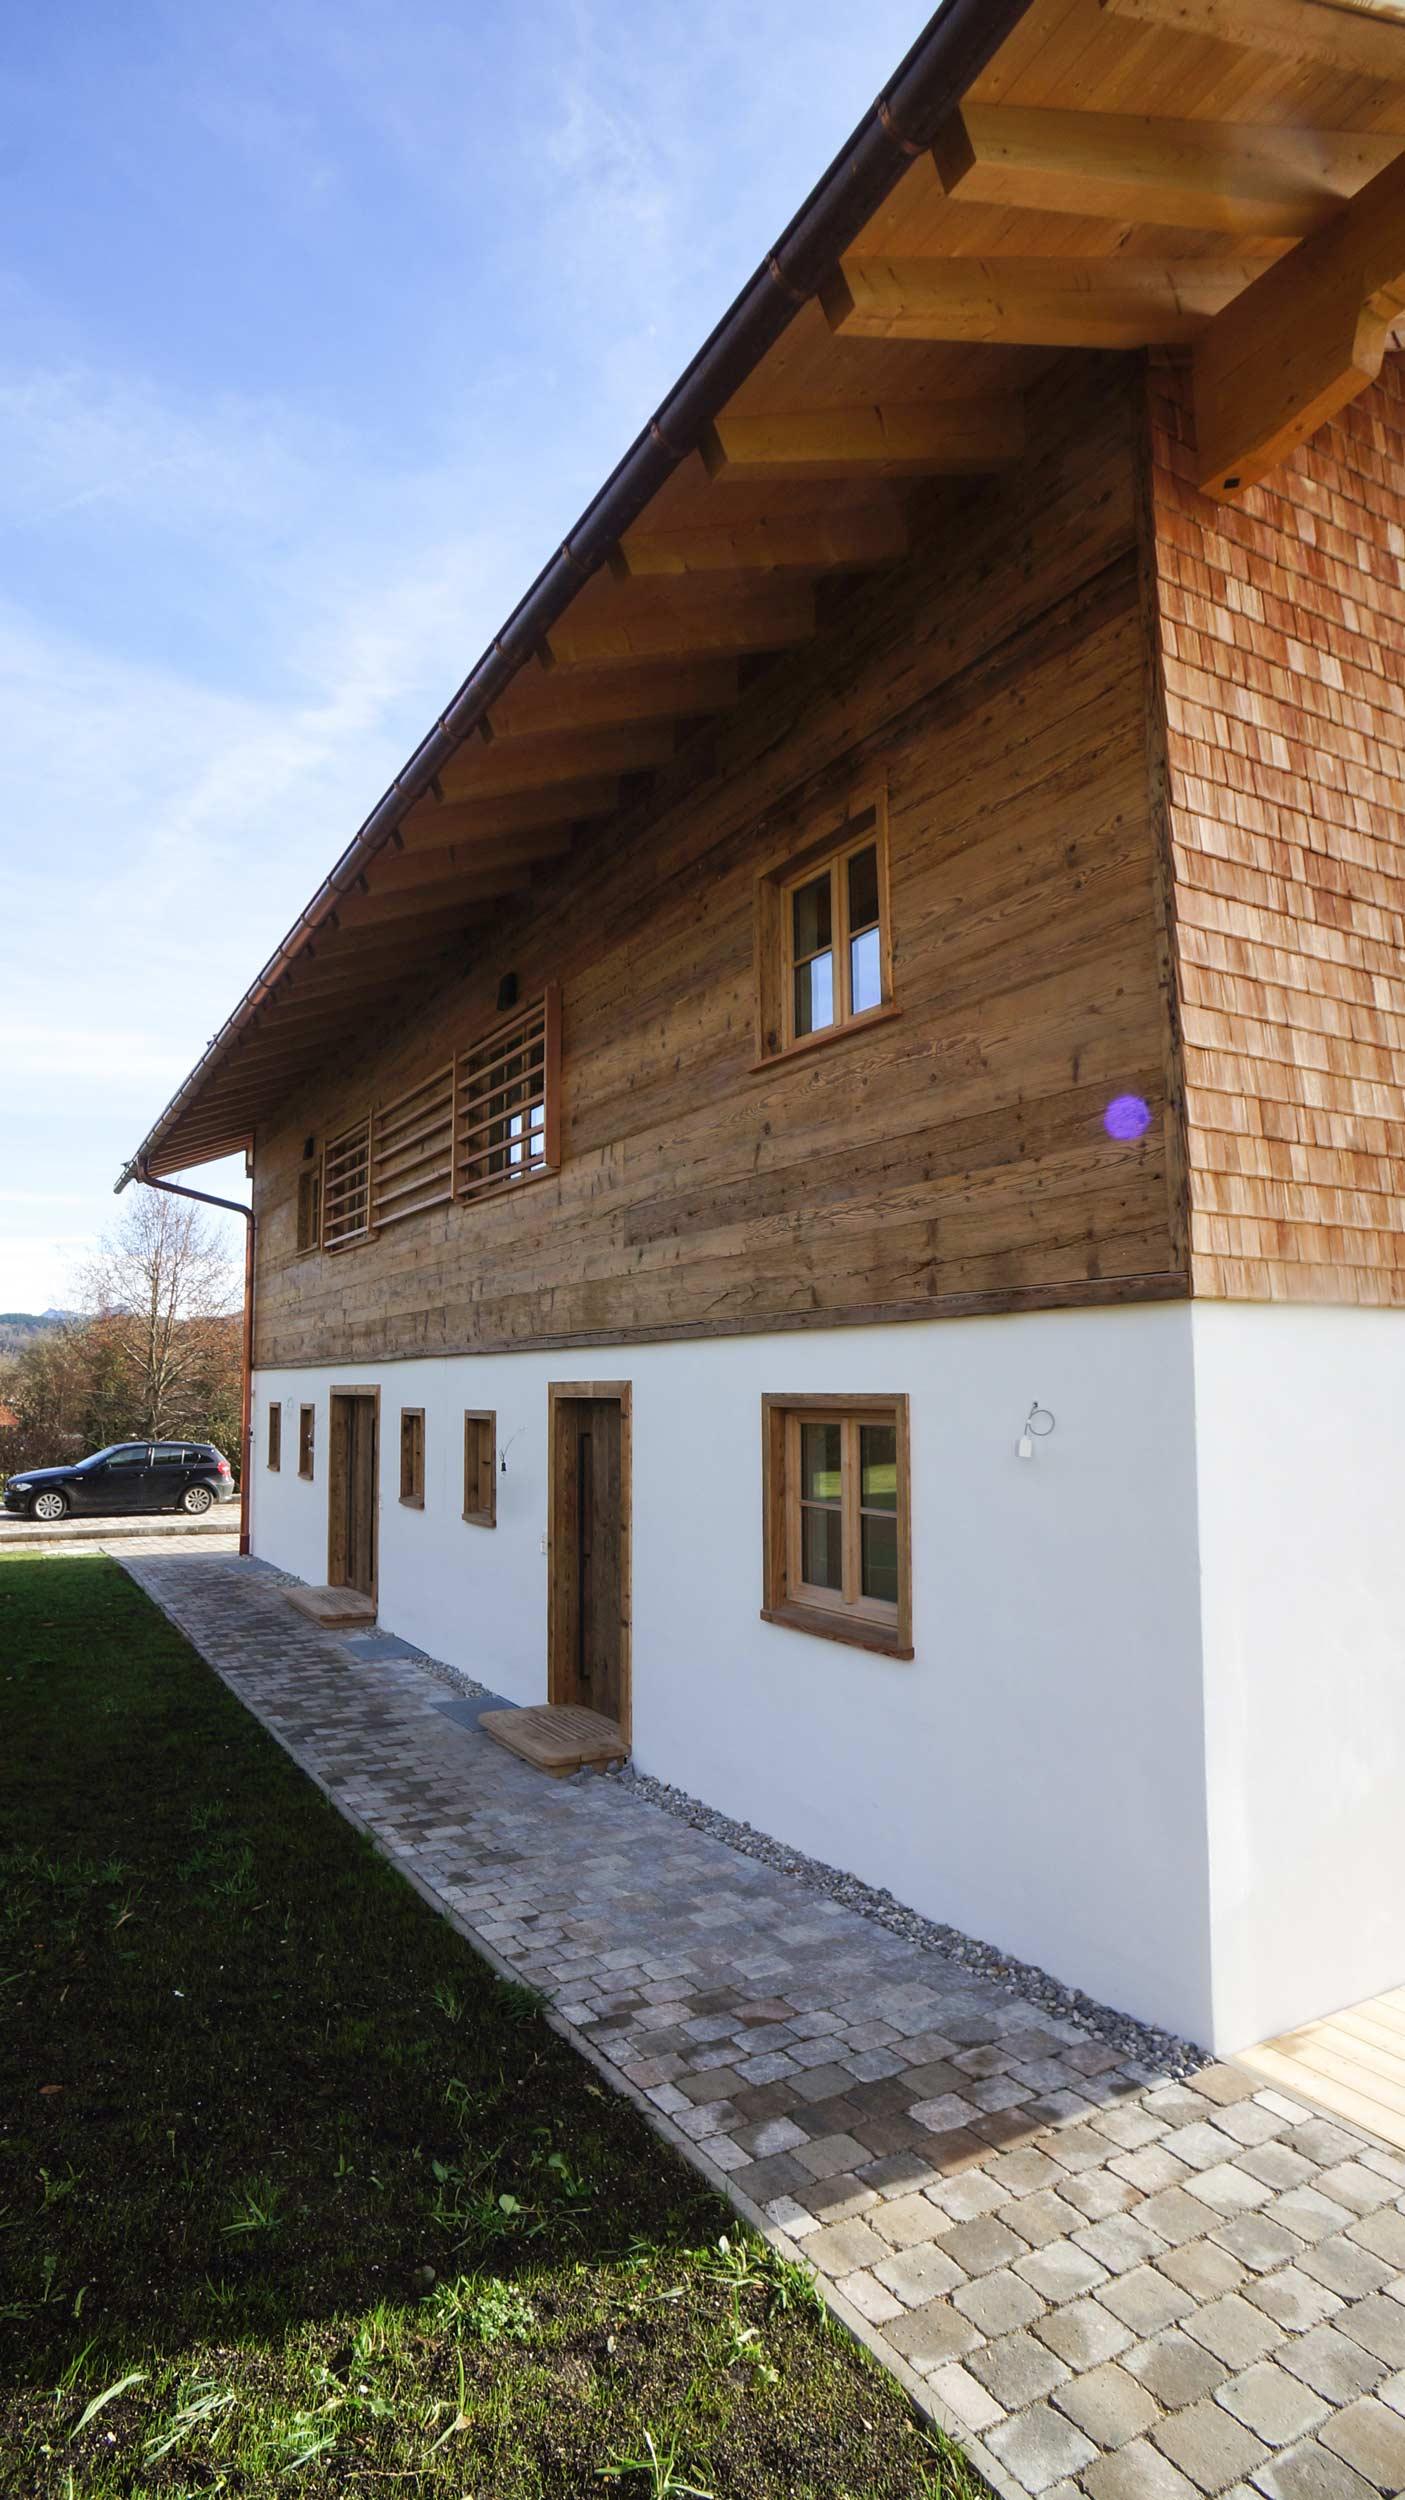 zimmerei-stoib-holzbau-holzhaus-altholz-fassade-blockschalung-balkon-terrassentür-außenschalung-miesbach-garten-13.jpg